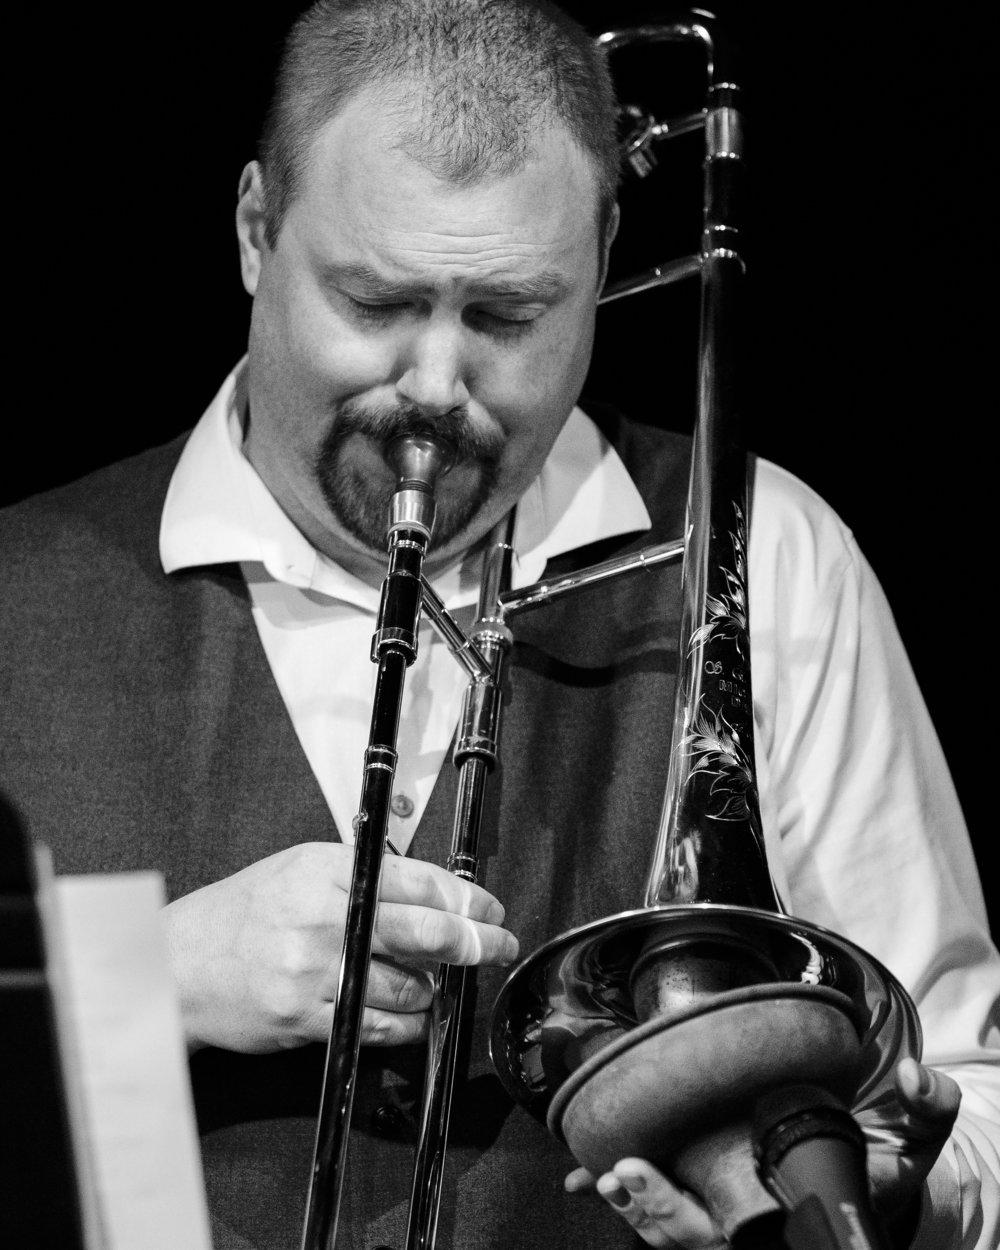 Matt Lennex on the trombone at The Nash Jazz Phoenix - Joseph Berg Photography